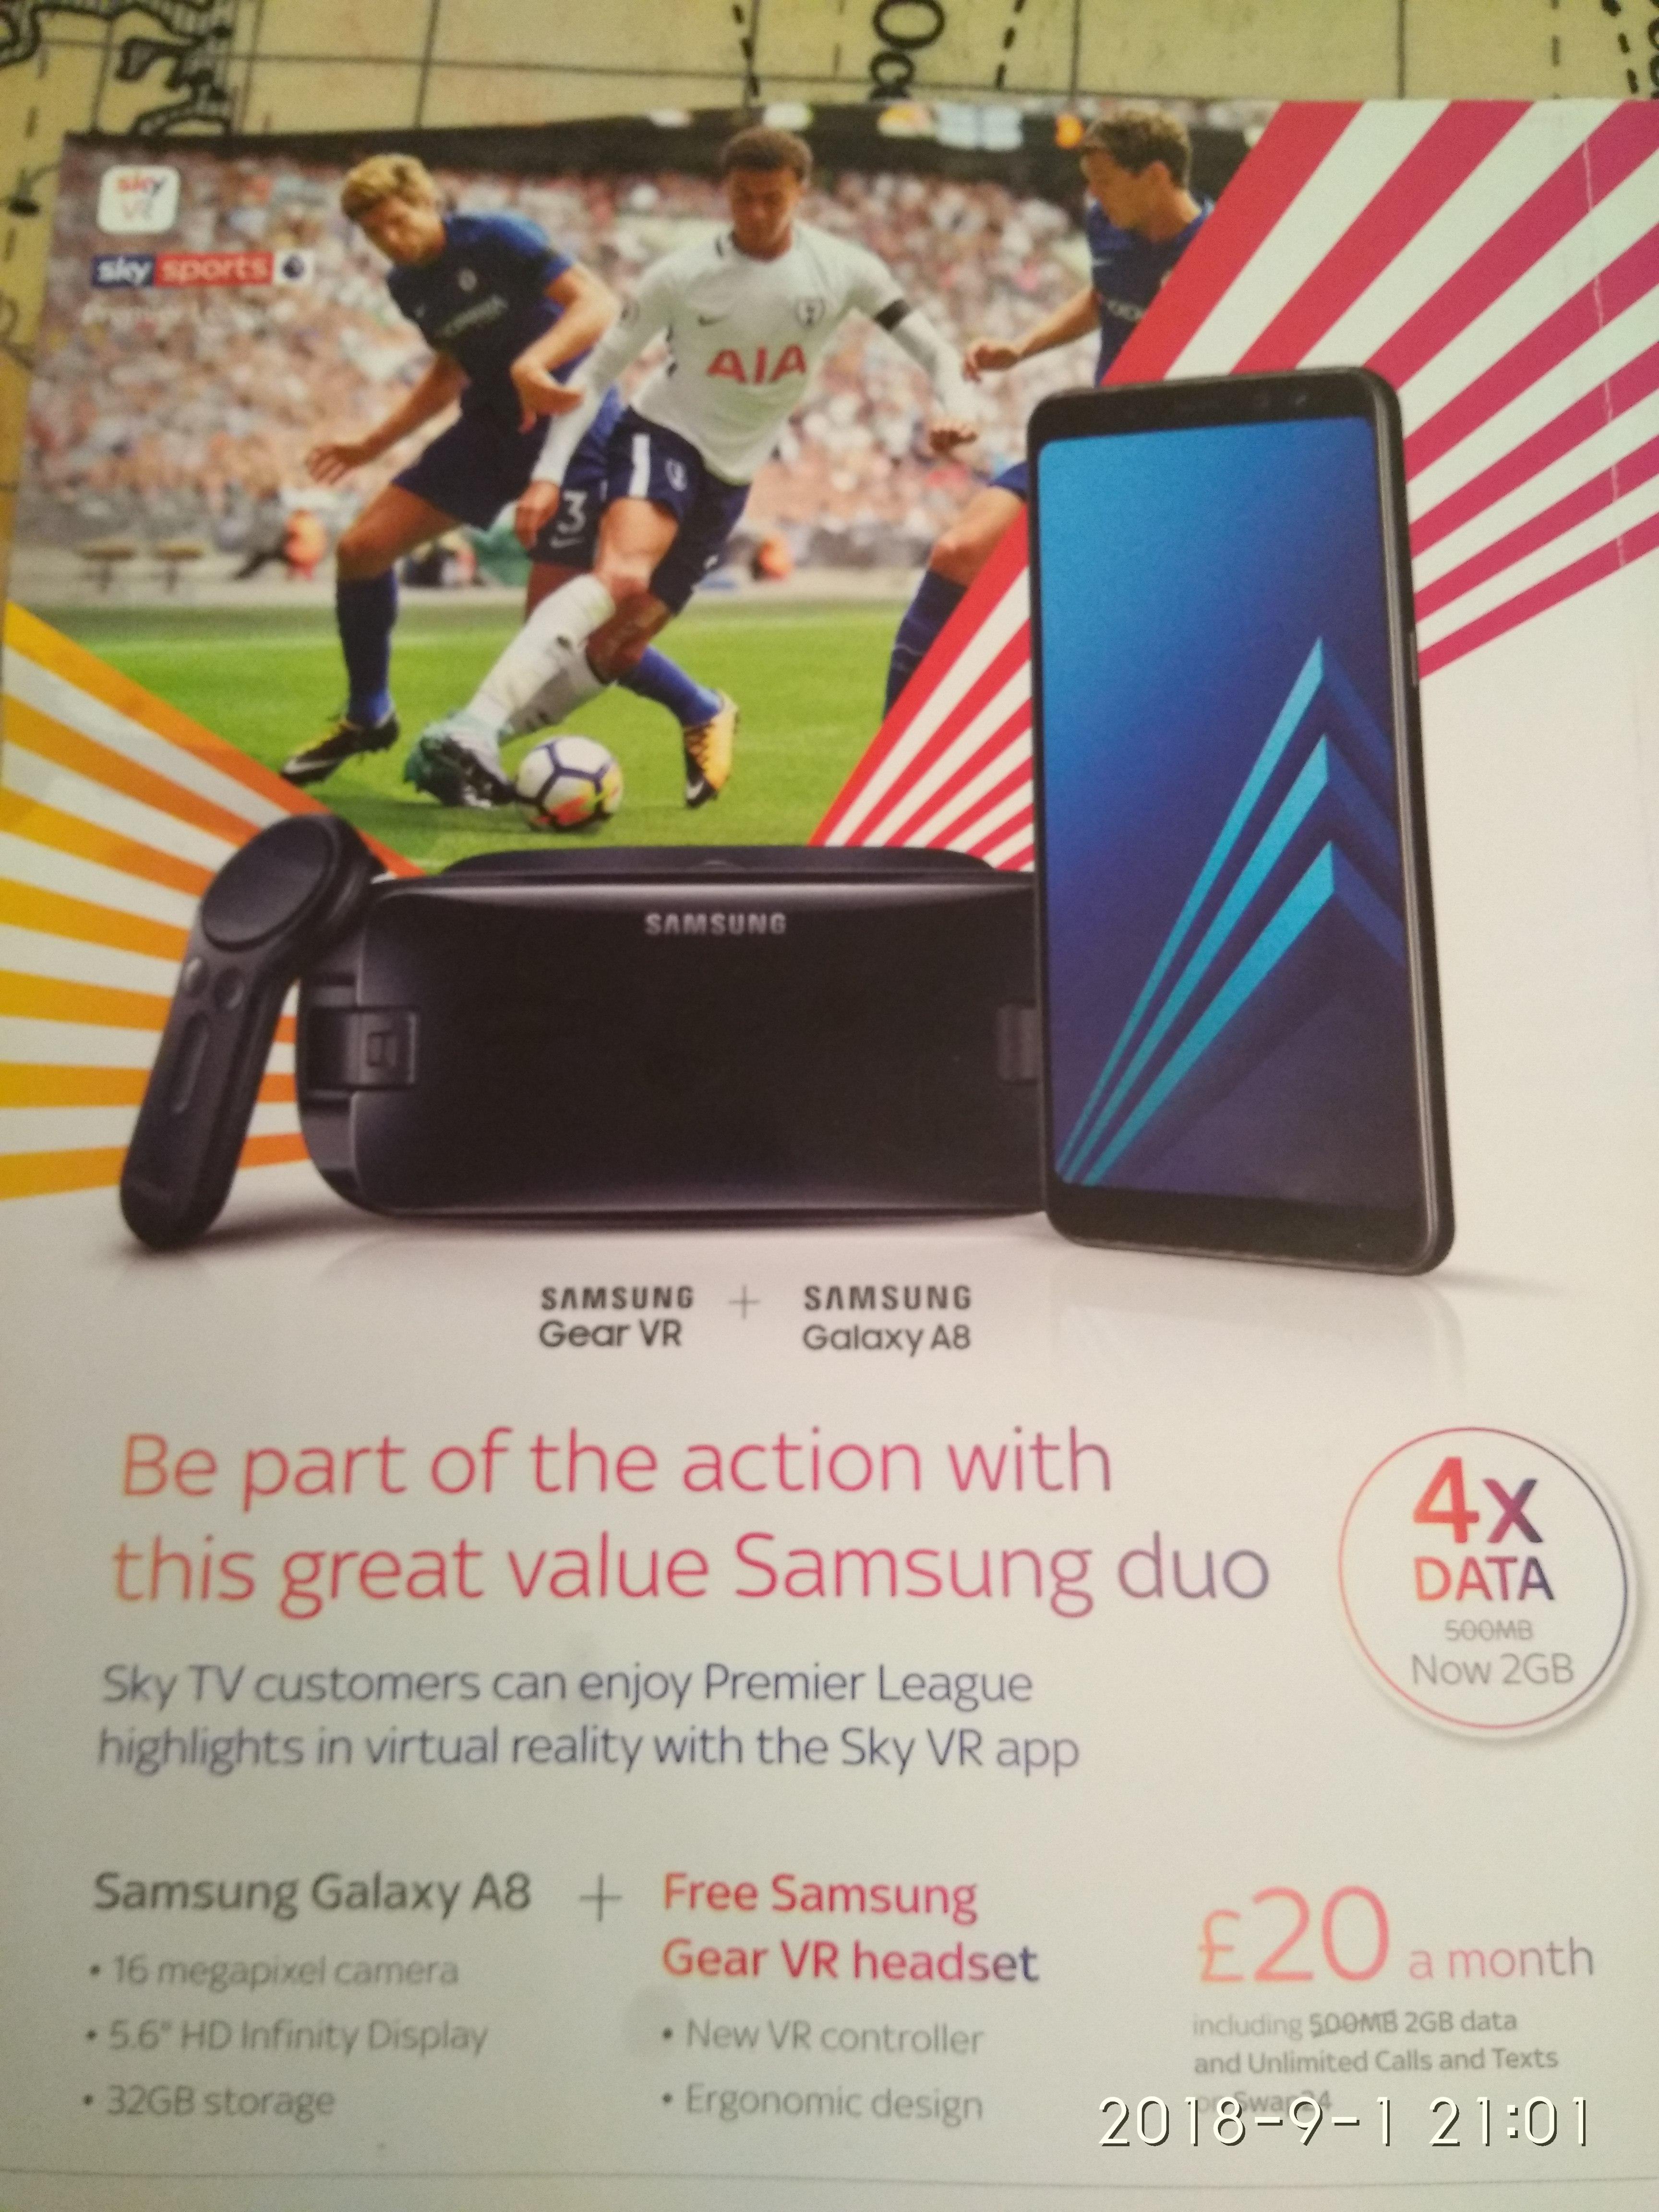 Samsung Galaxy A8 + Samsung Gear VR for 20 a month